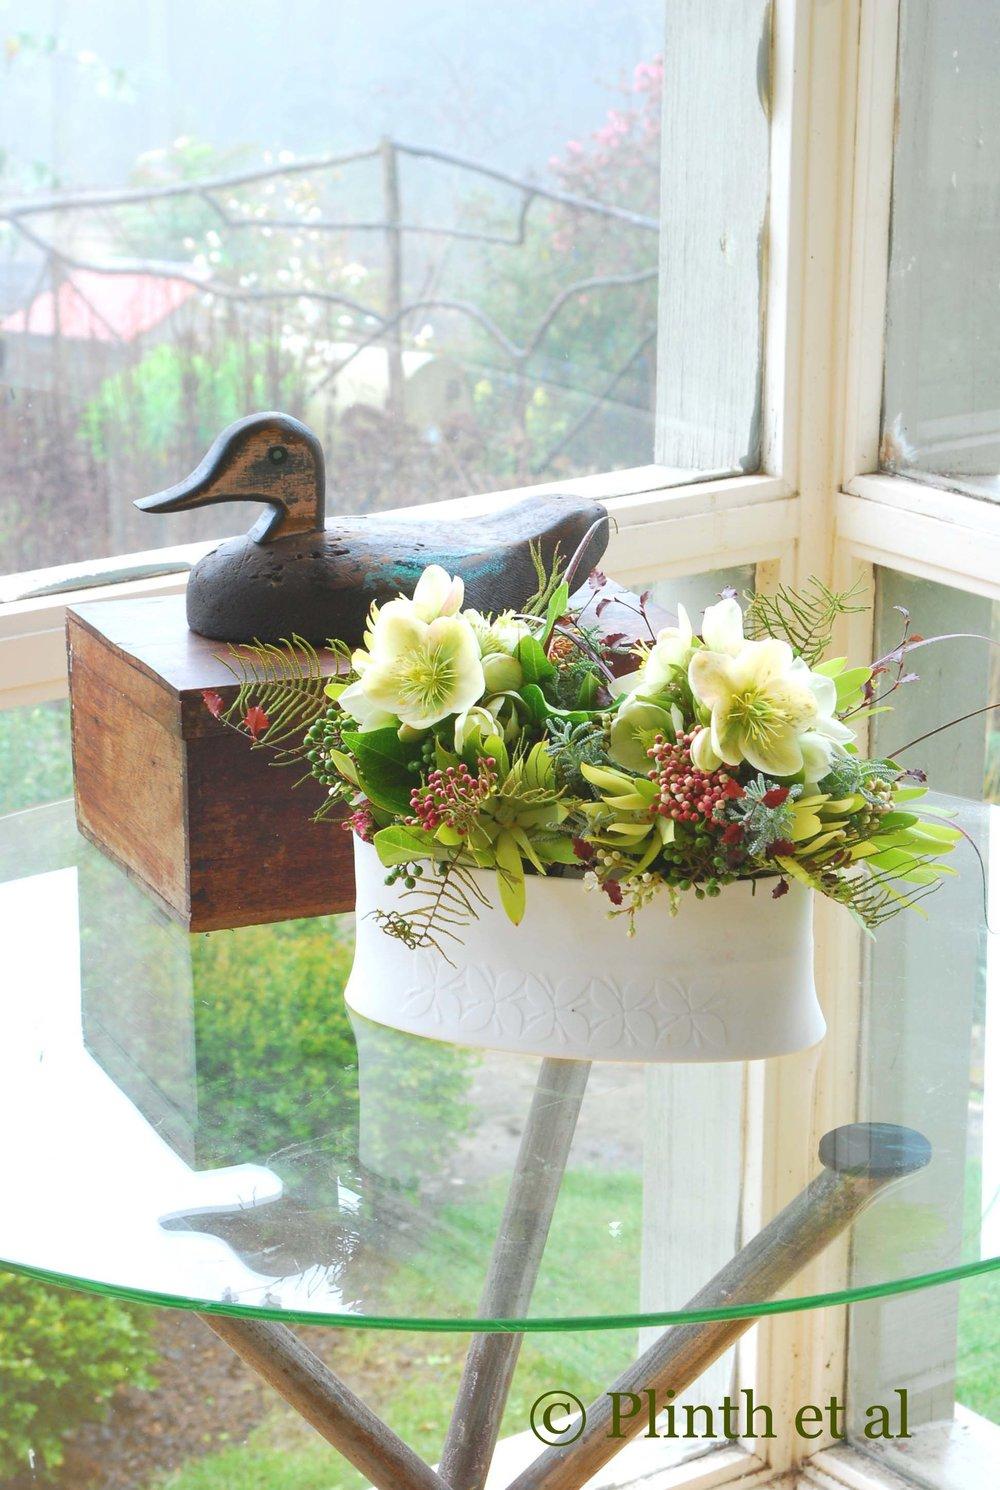 helleborus-viburnum-tinus-pittosporum-duck.jpg